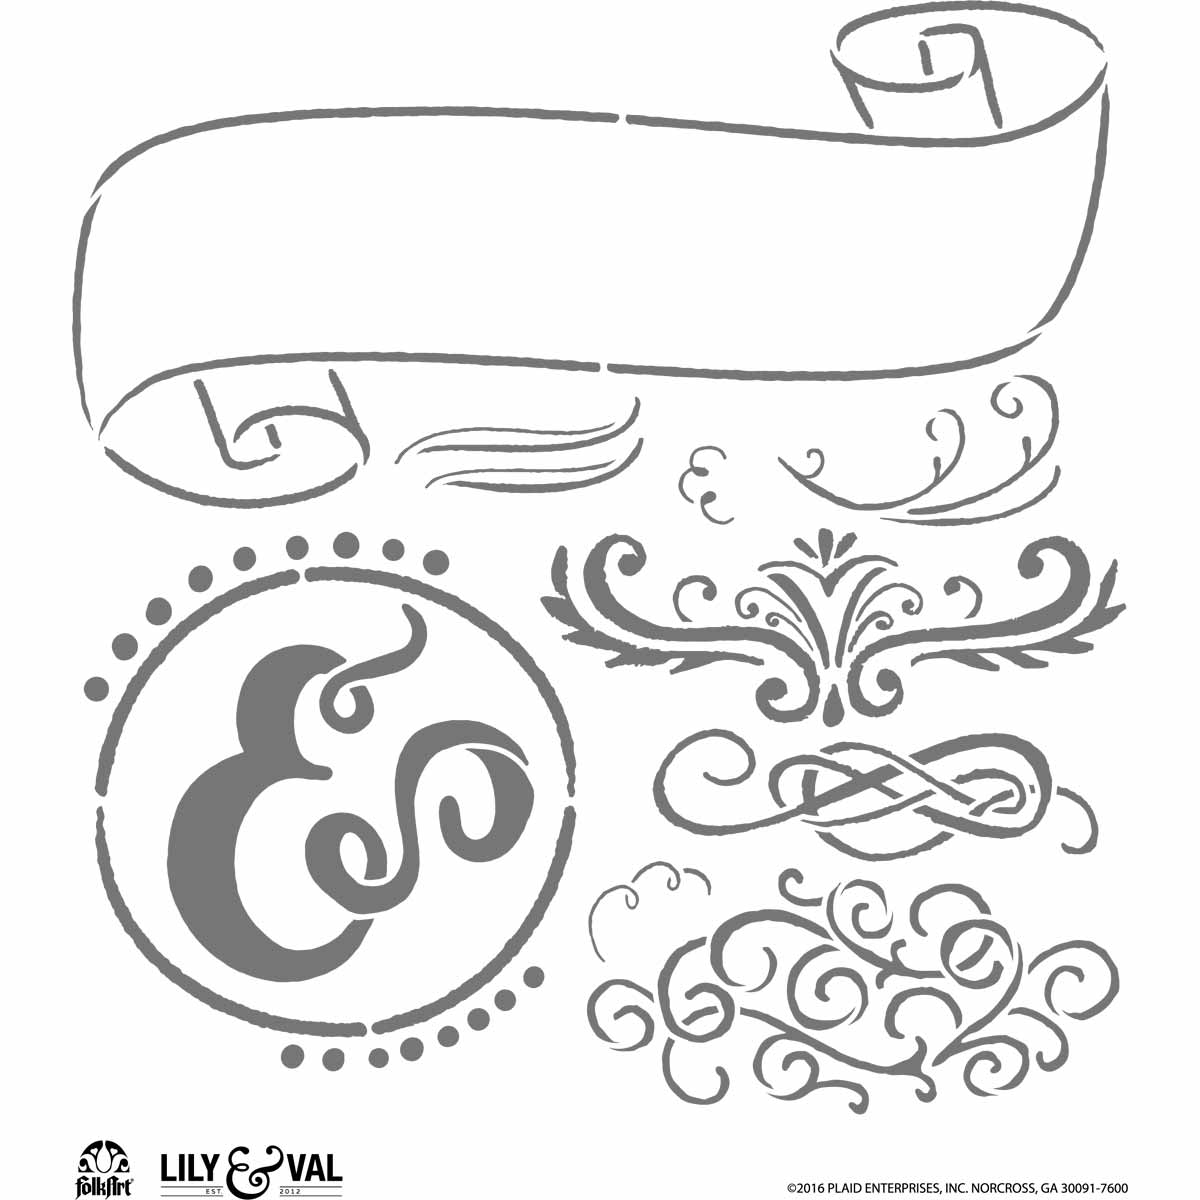 FolkArt ® Lily & Val™ Stencils - Variety Packs - Market Fresh